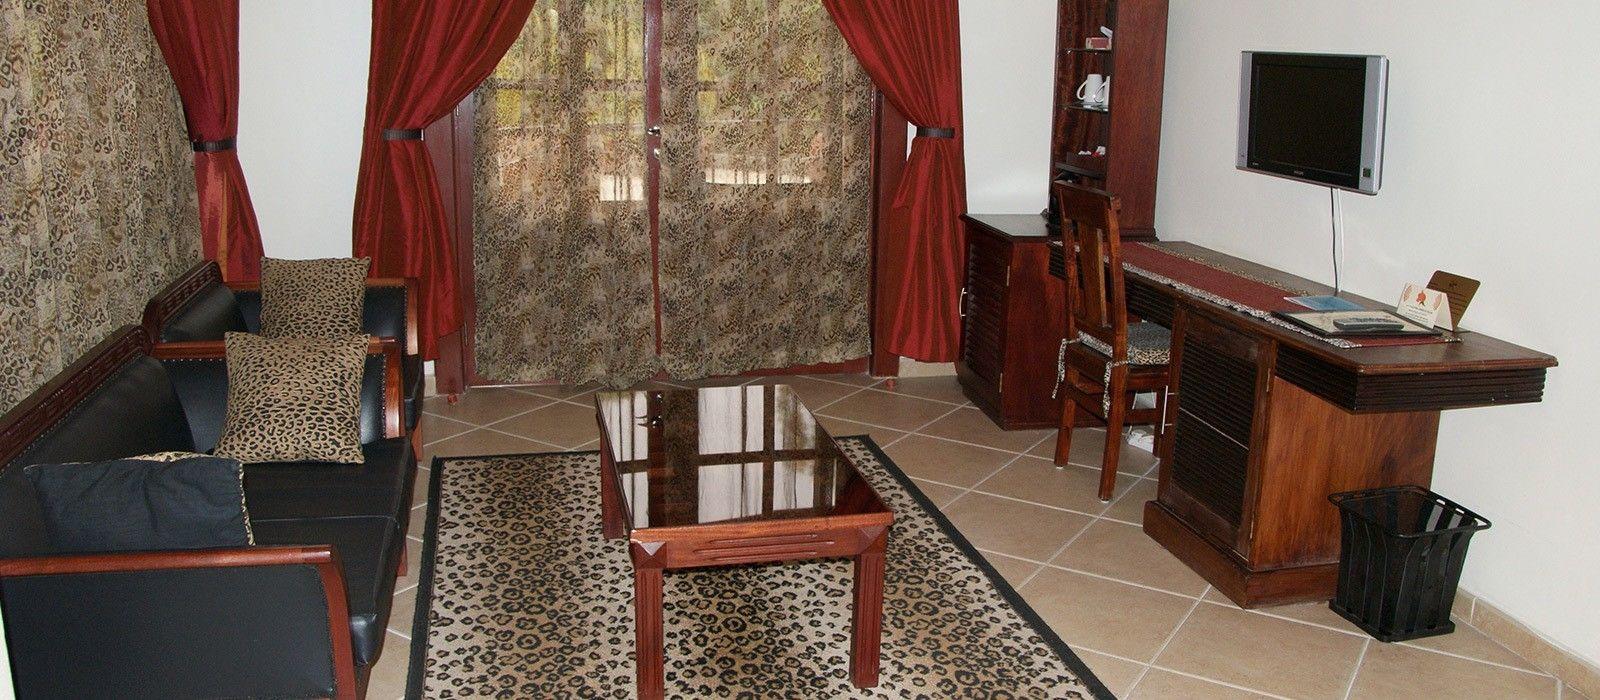 Hotel The African Tulip Tansania